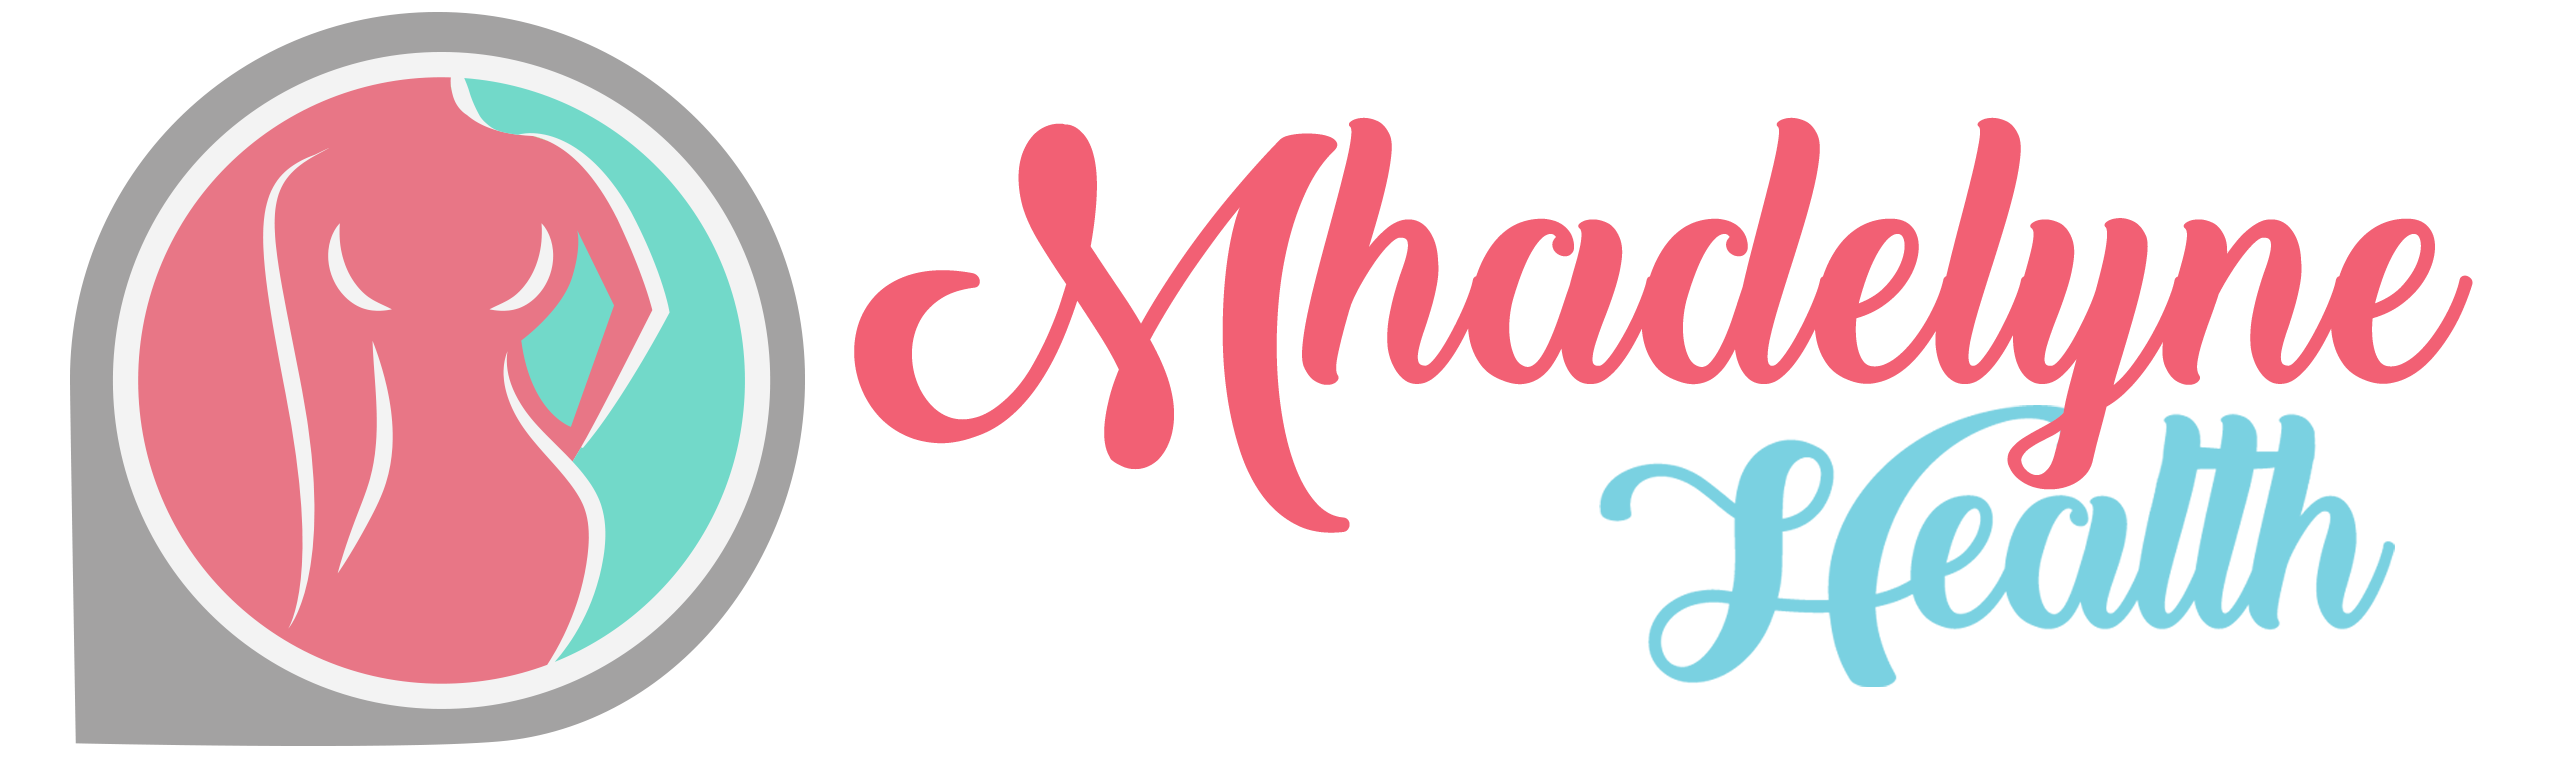 mhadelynehealth.com